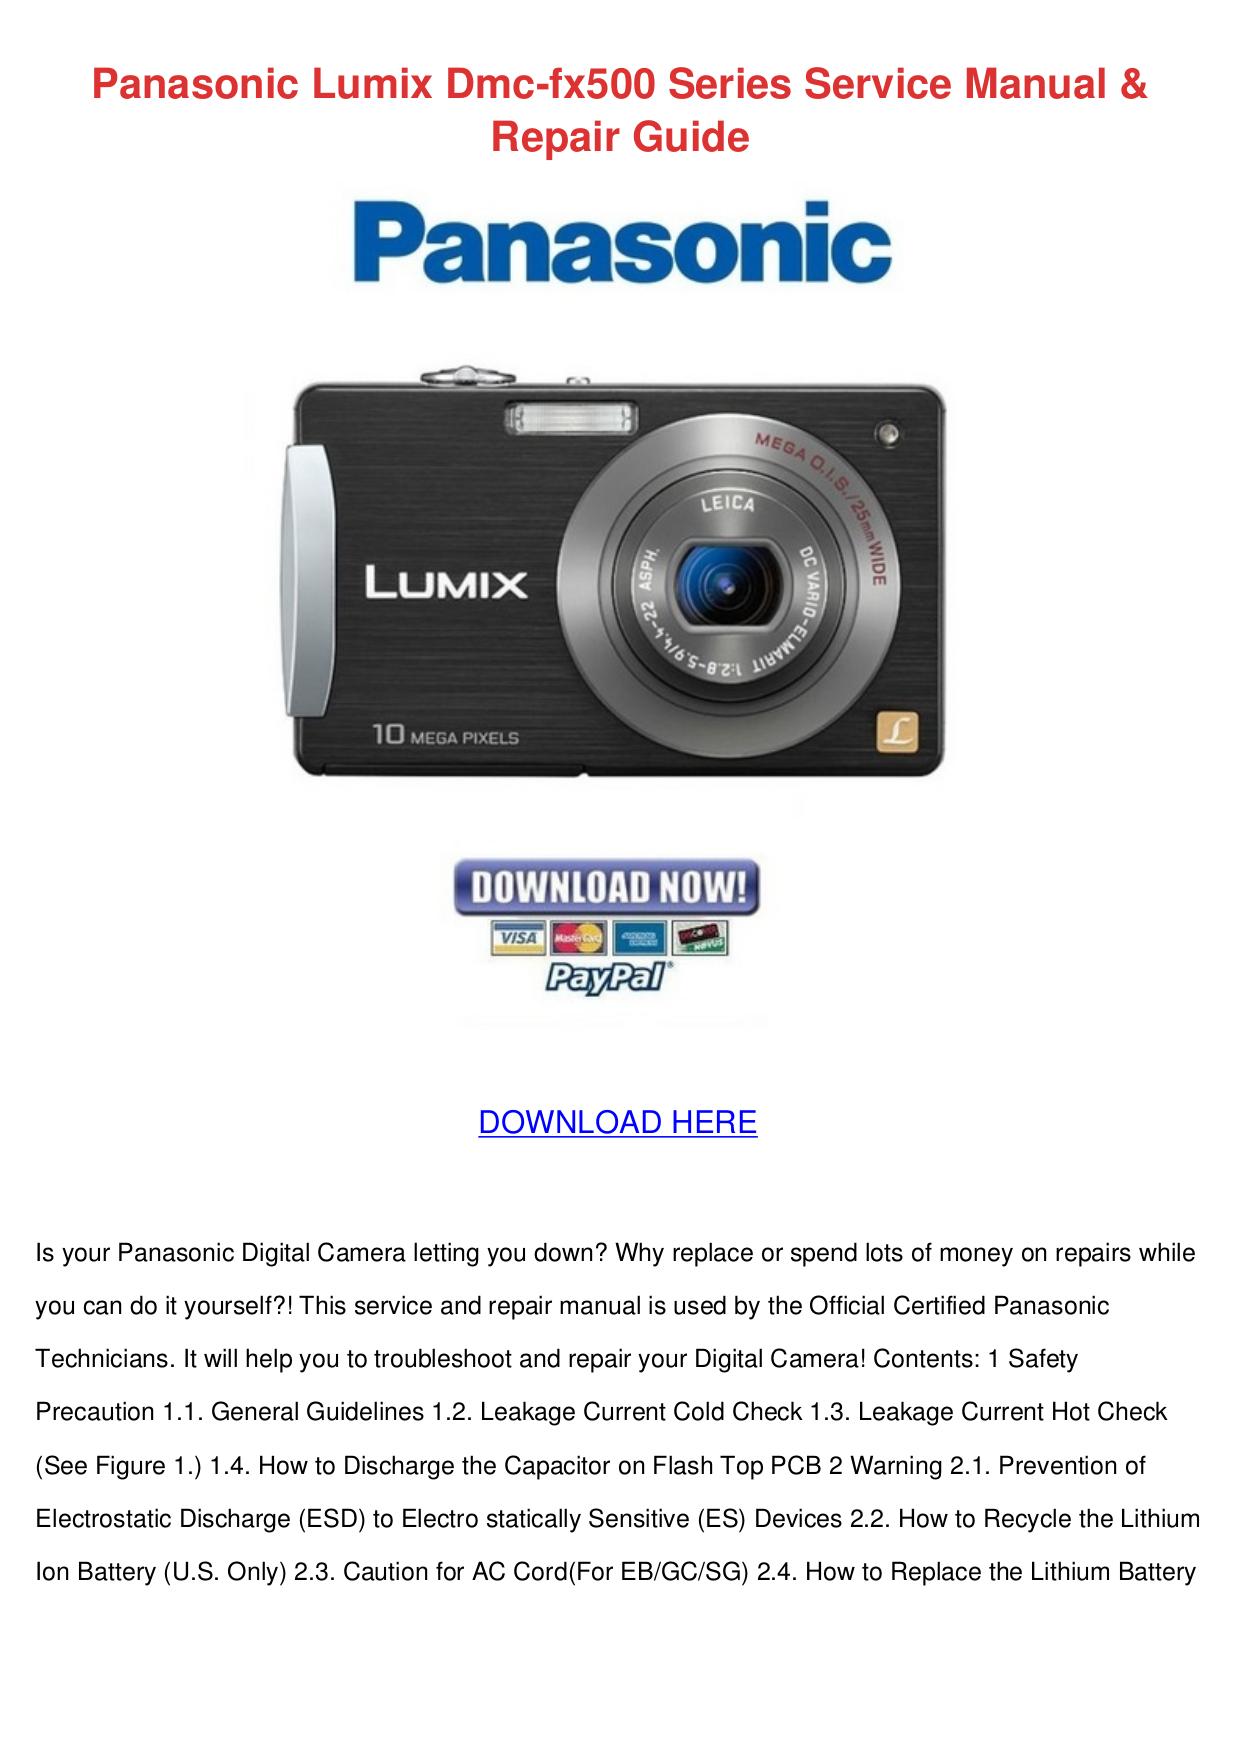 Panasonic lumix dmc-fx500 digital camera user manual(pdf.